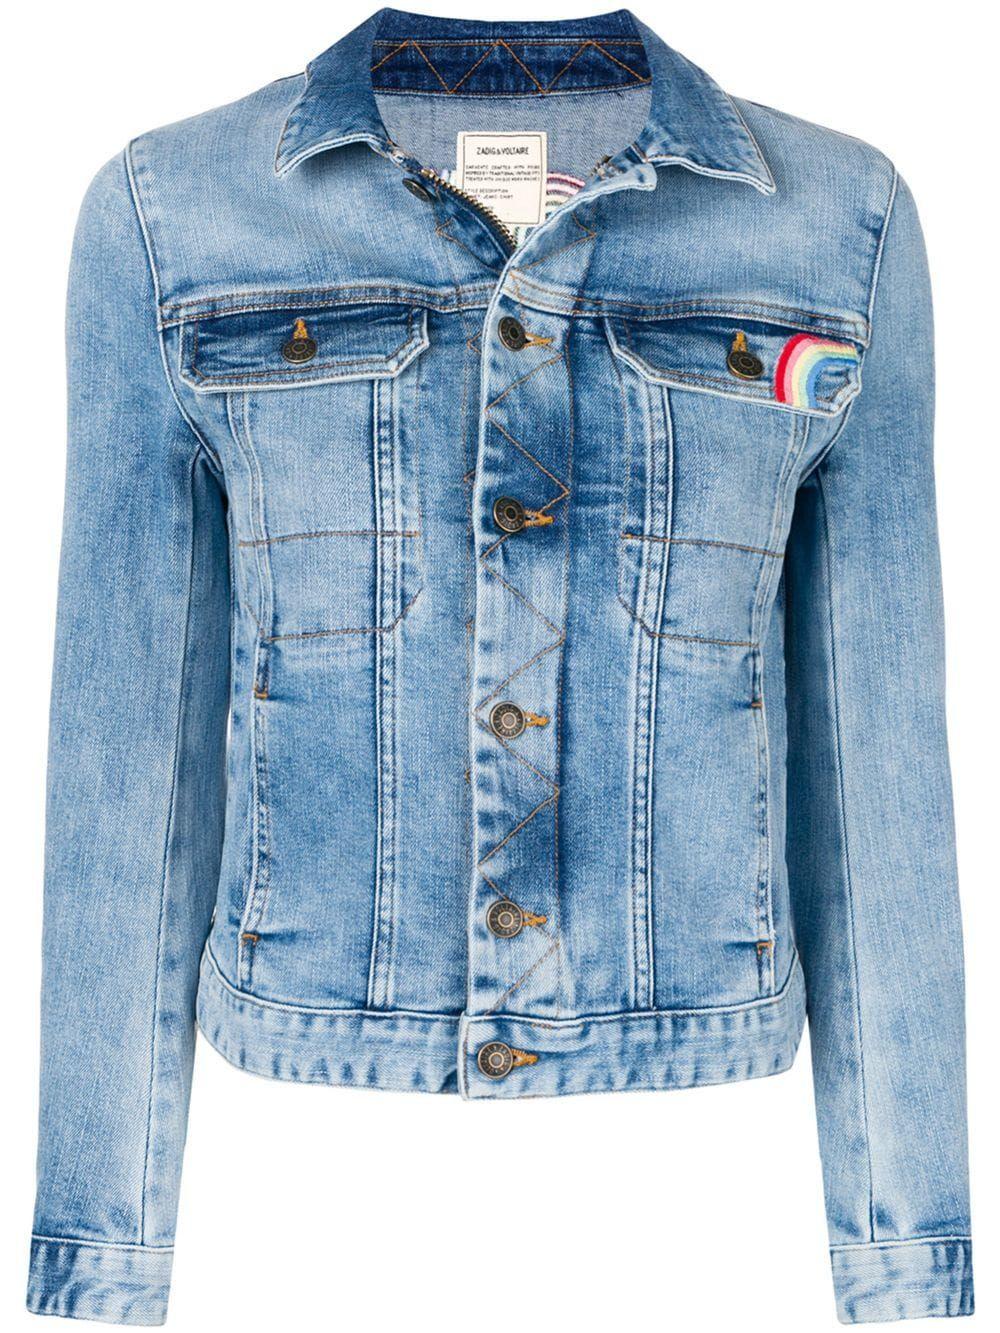 14266c5ec Zadig&Voltaire 'LOVE' denim jacket - Blue in 2019   Products ...